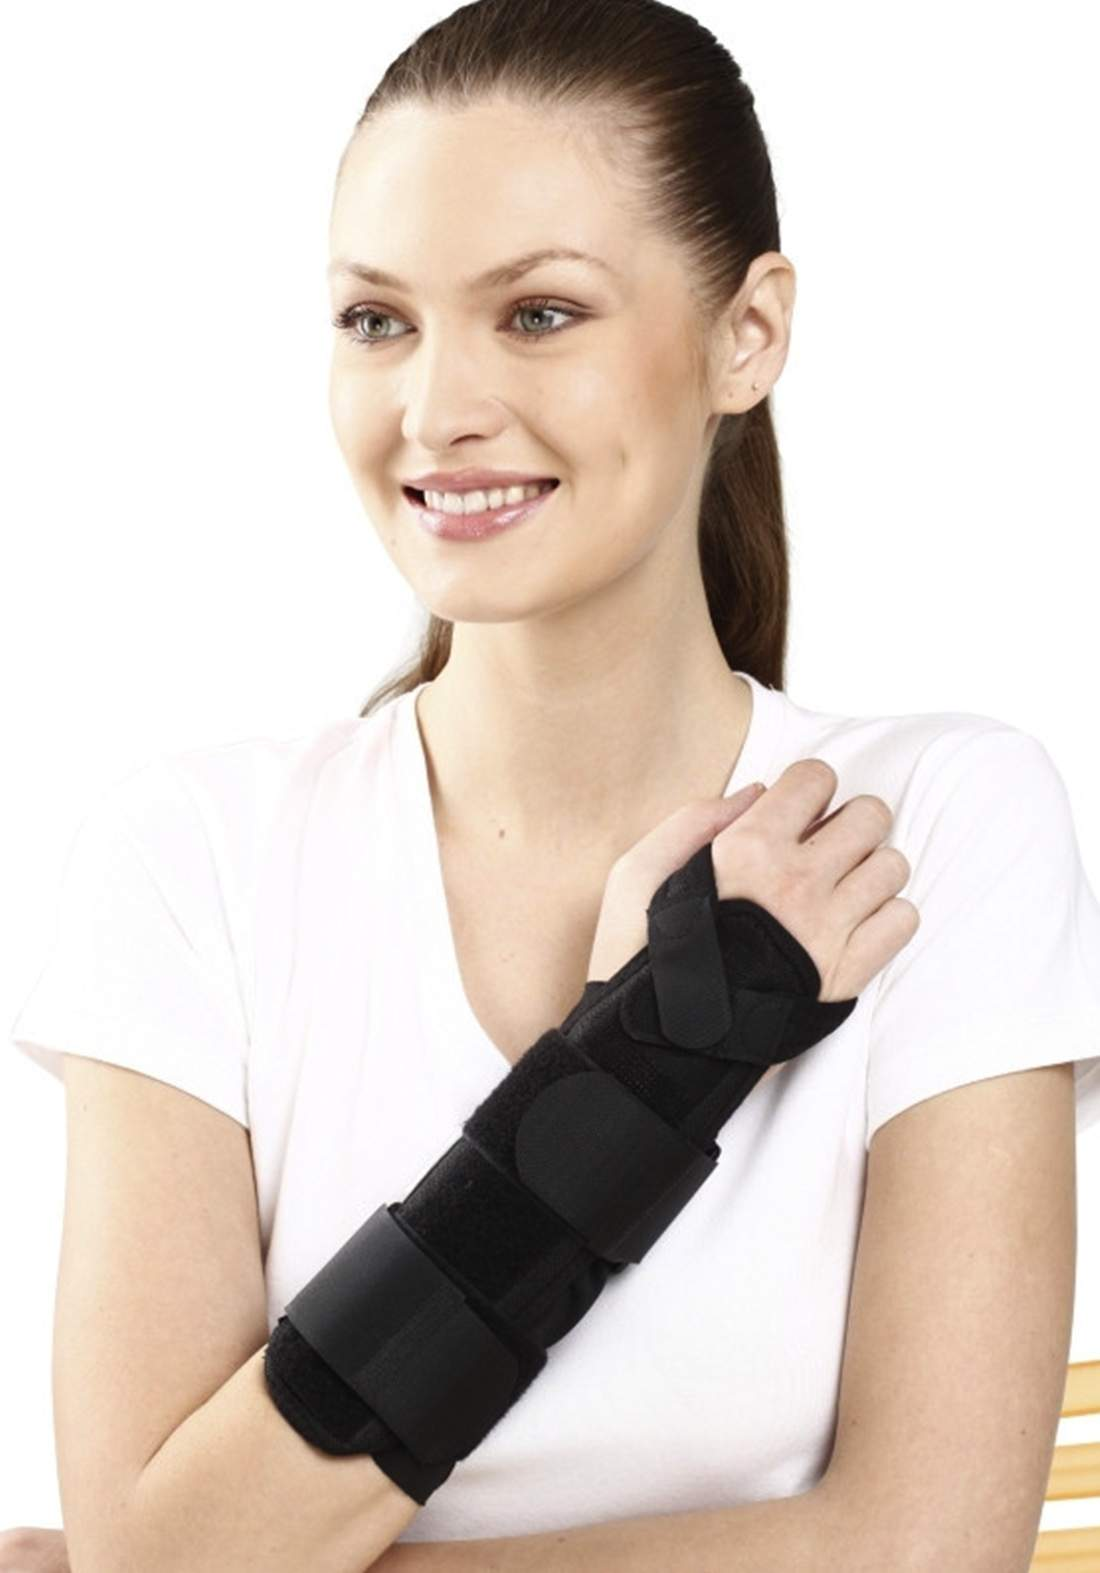 Tynor E-30 Wrist & Forearm Splint Right/Left جبيرة المعصم والساعد